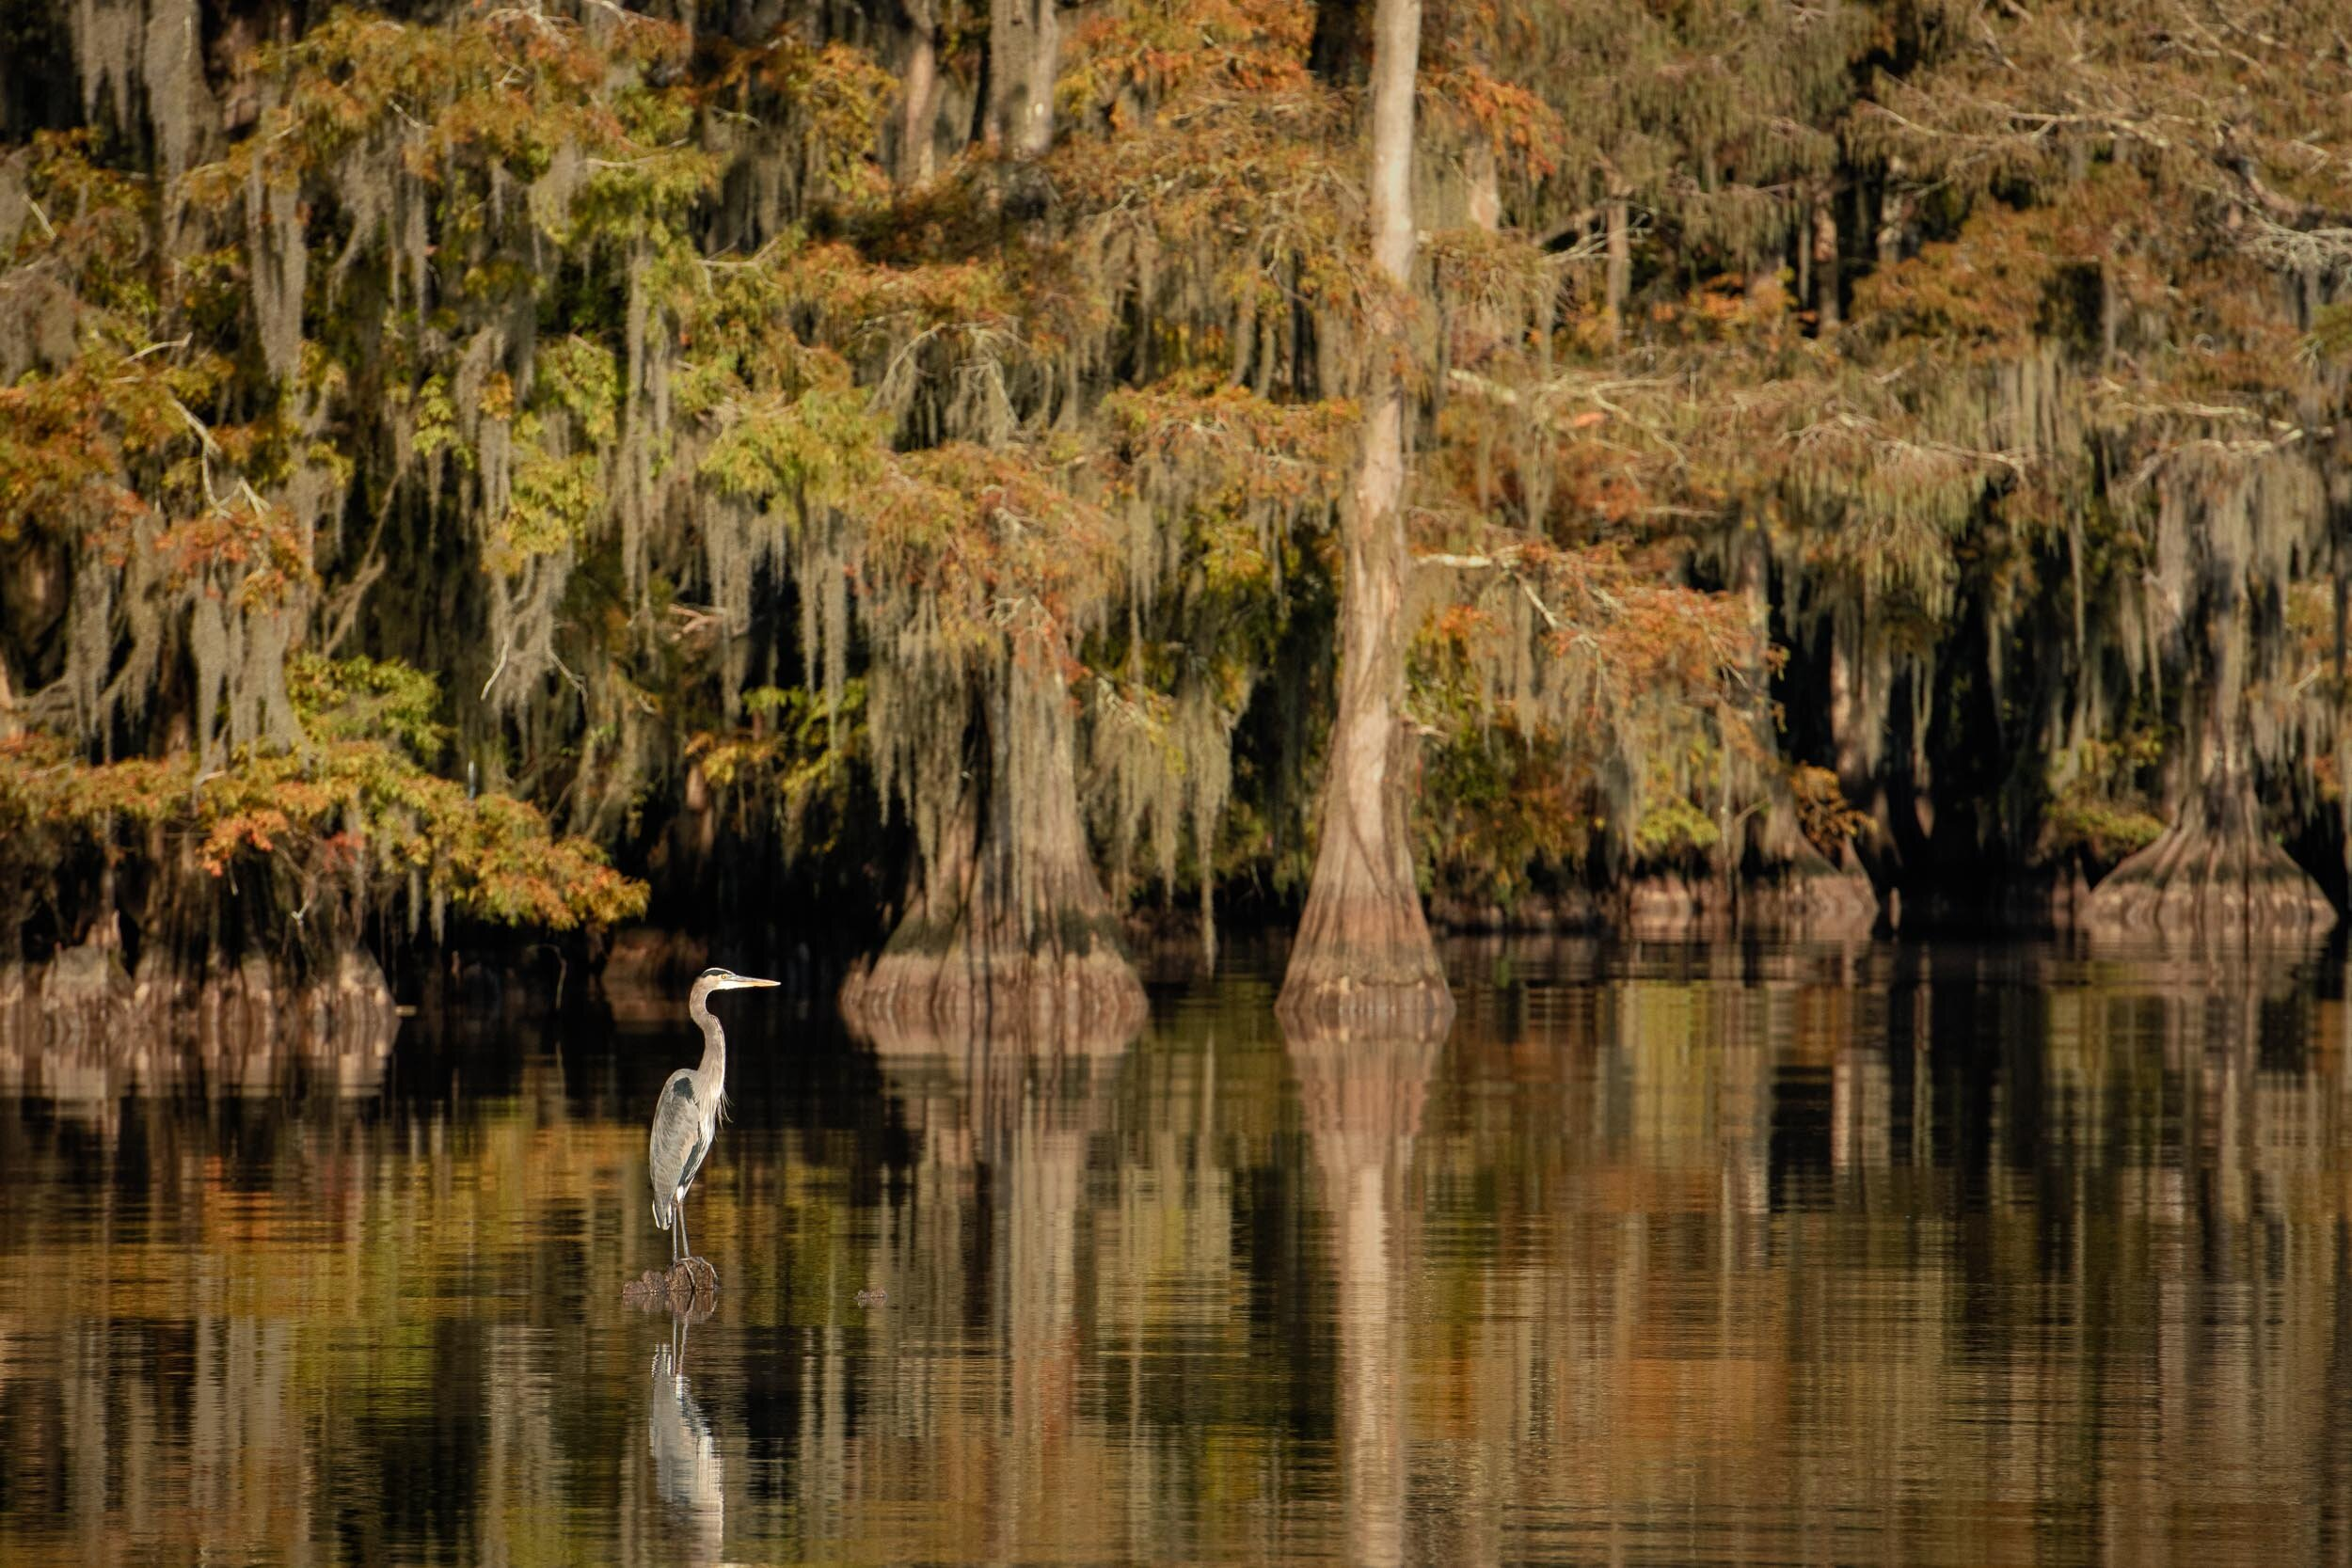 Great Egret in Fall Foliage–Lake Dauterive Fall 2018